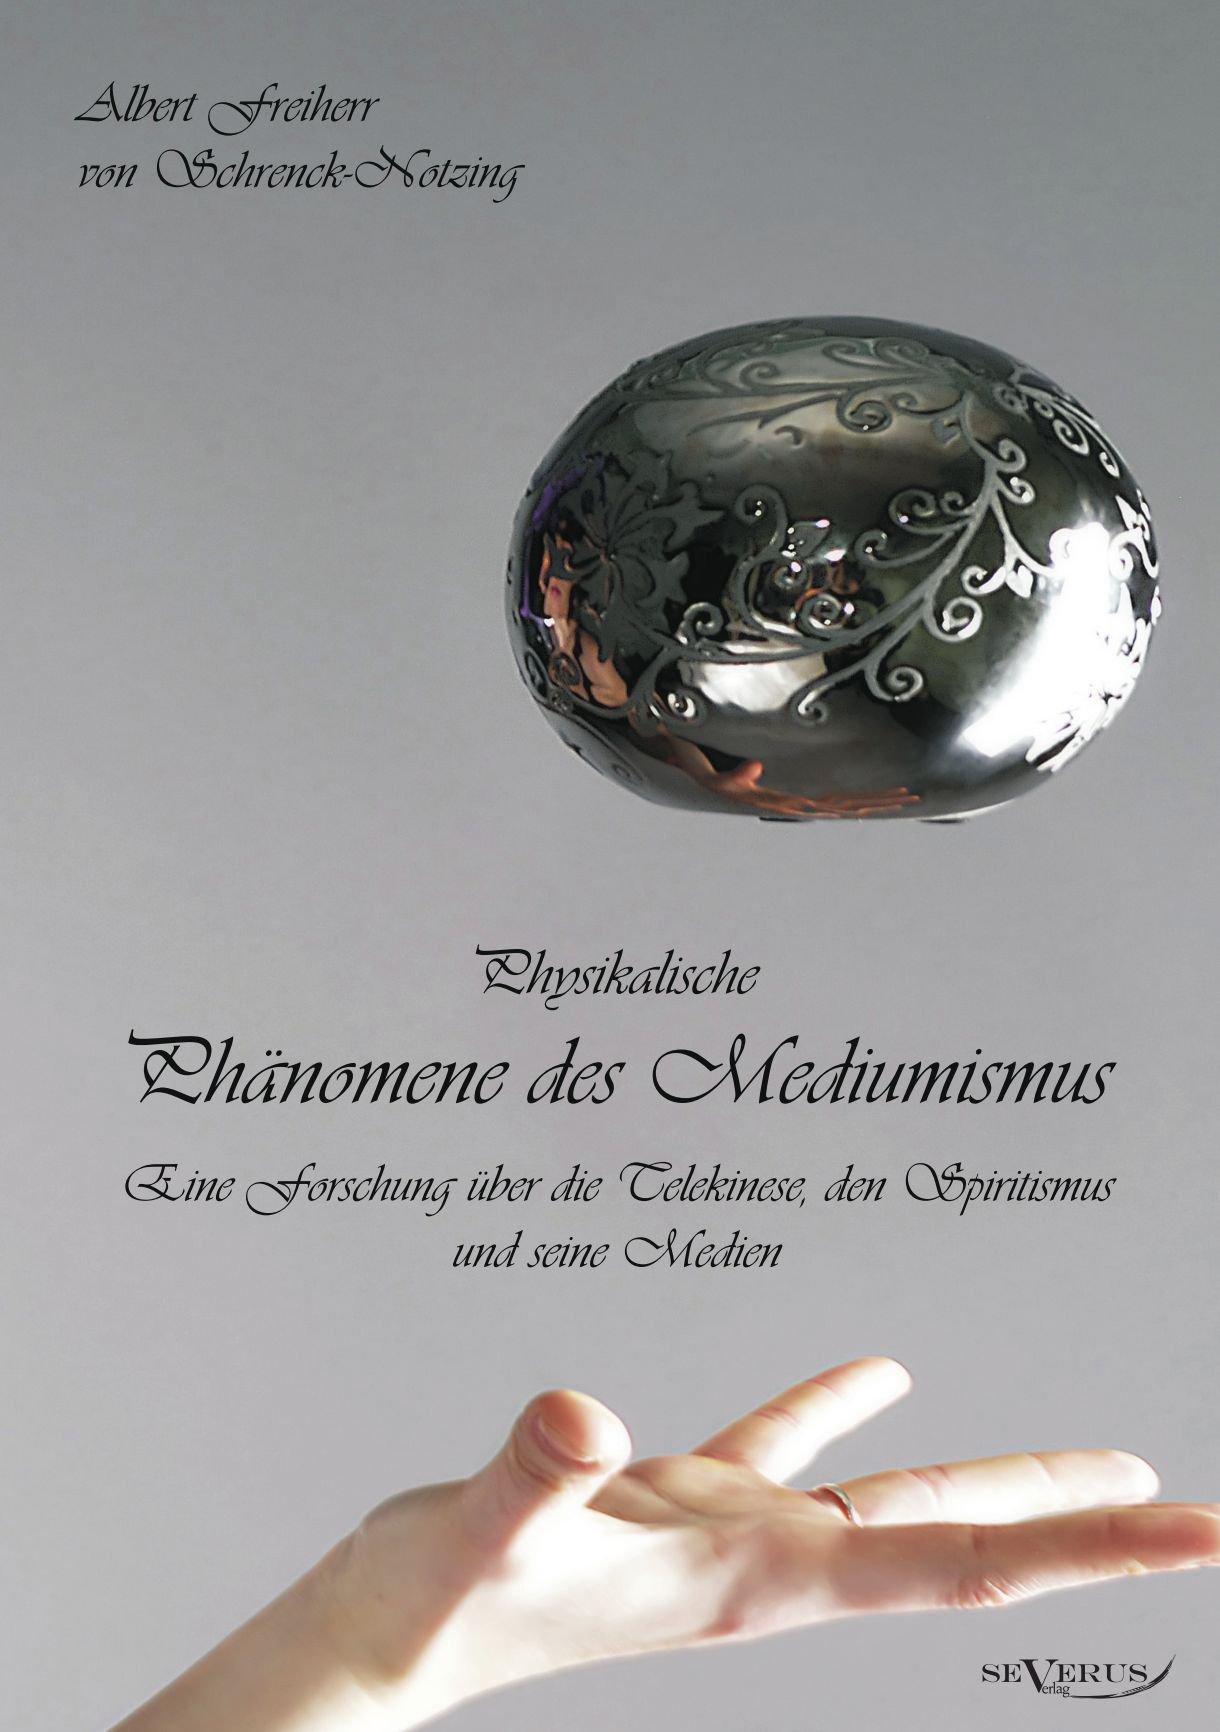 Physikalische Phänomene des Mediumismus (German Edition) ebook